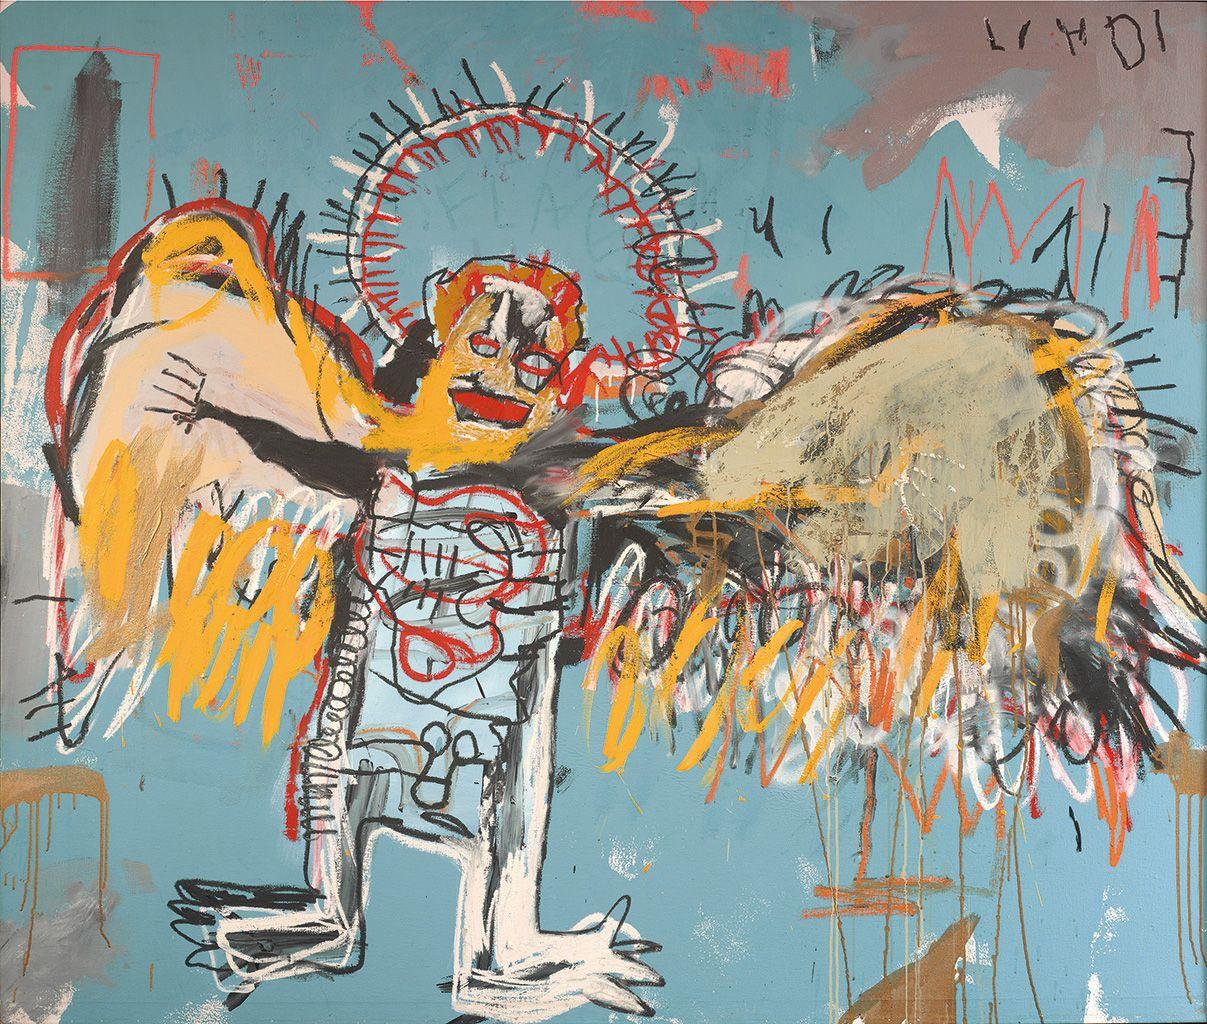 Fallen Angel, obra de Jean-Michel Basquiat